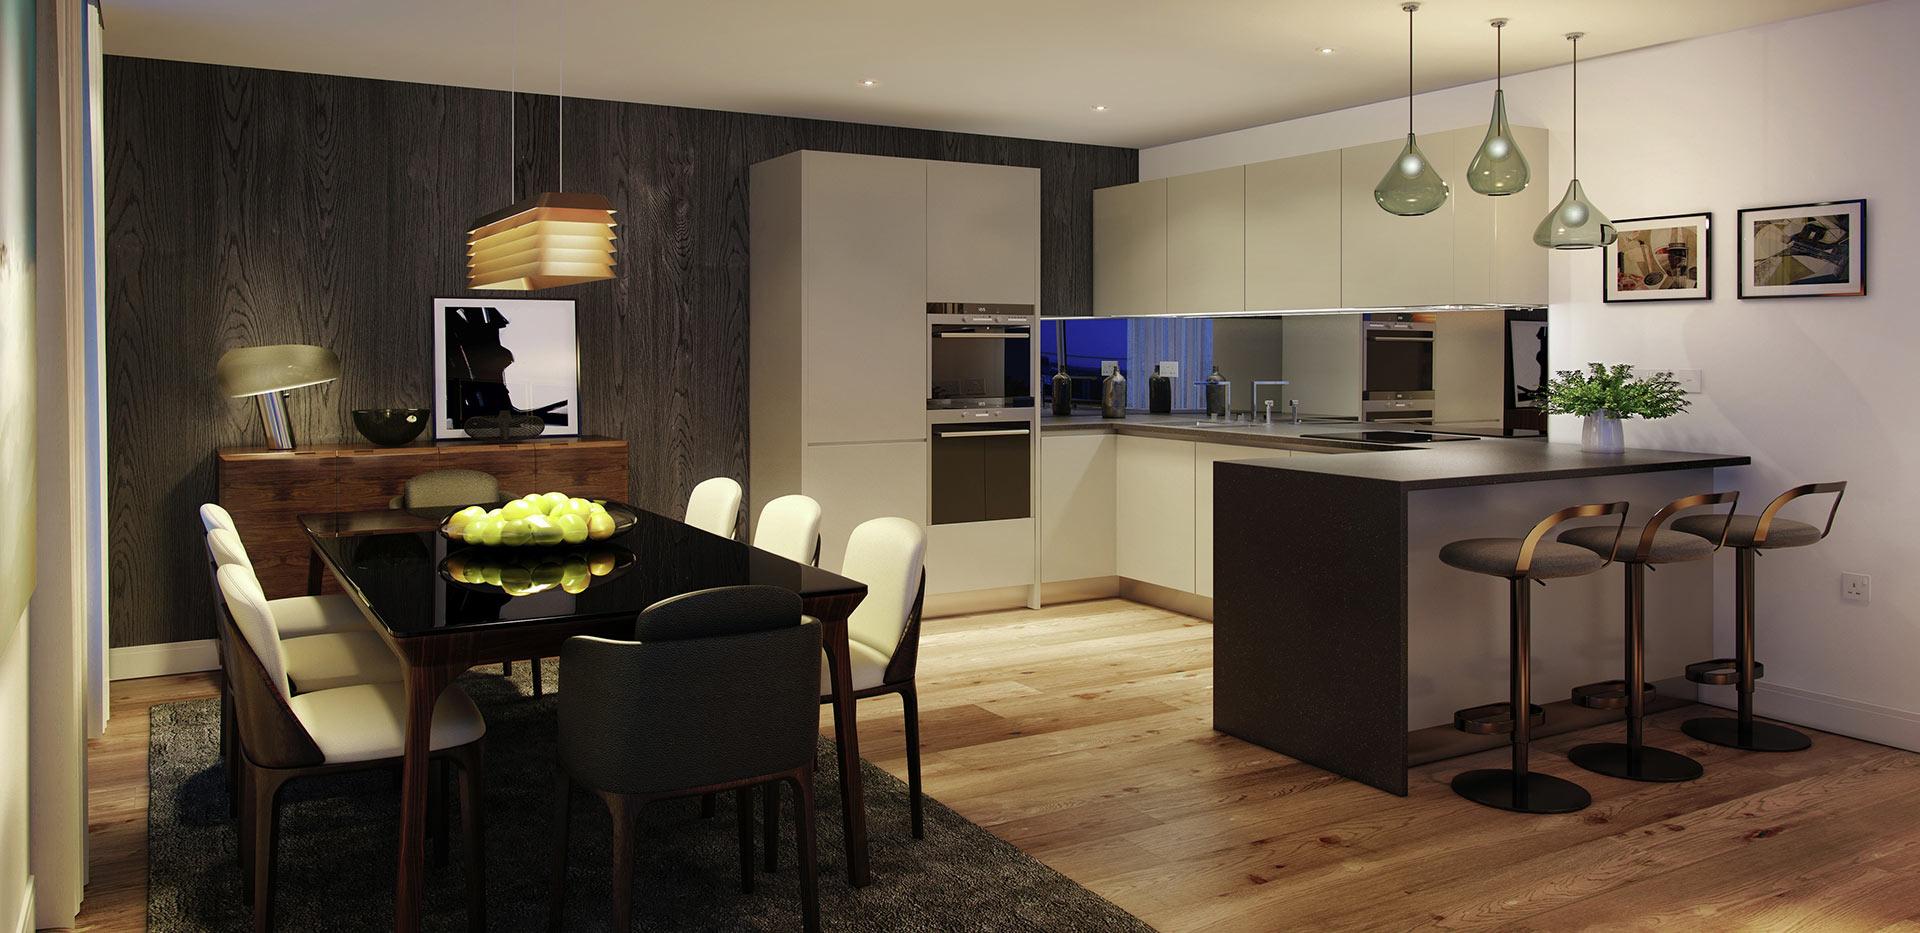 Berkeley, Vista, Dining Room & Kitchen, Interior